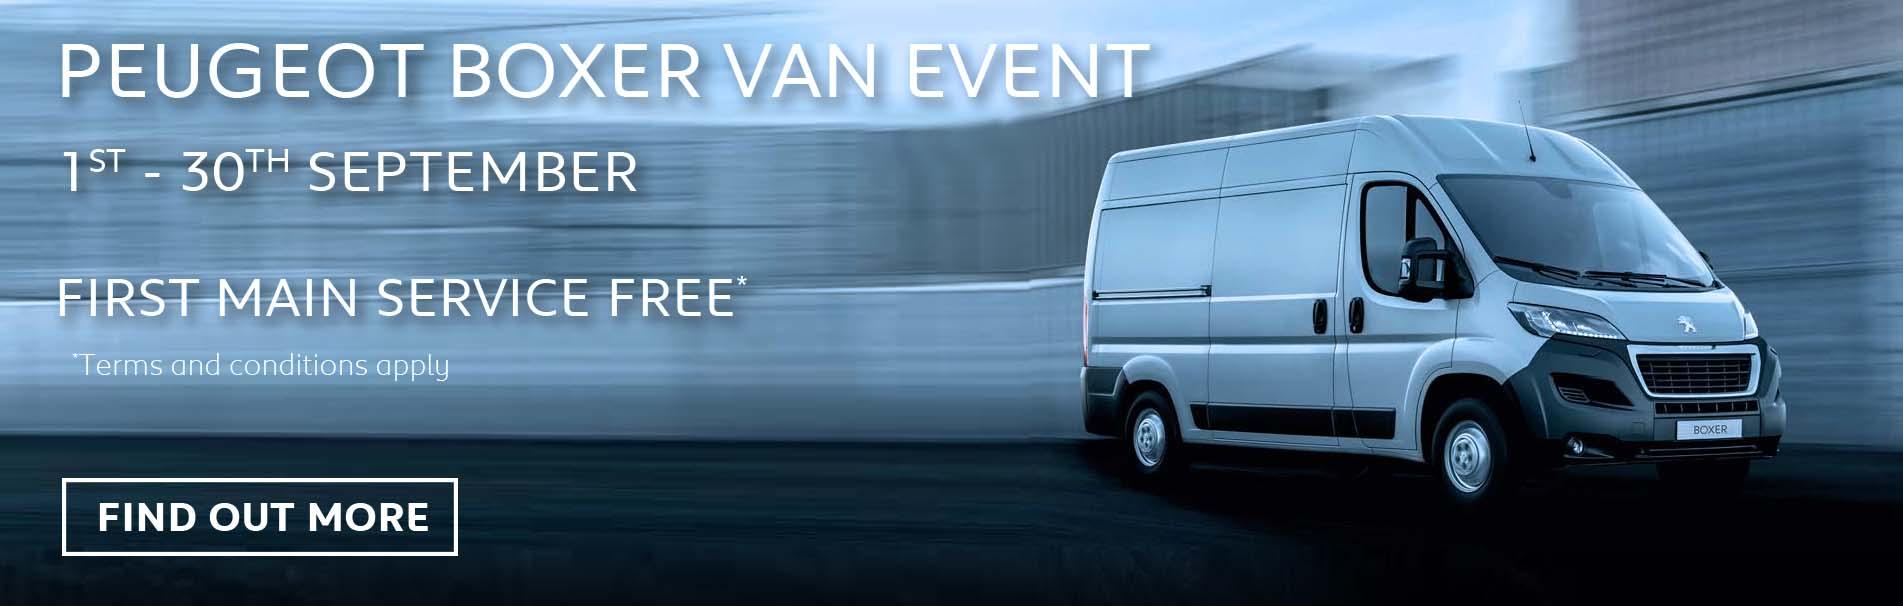 peugeot-boxer-van-event-aldershot-hampshire-commercial-sales-sli